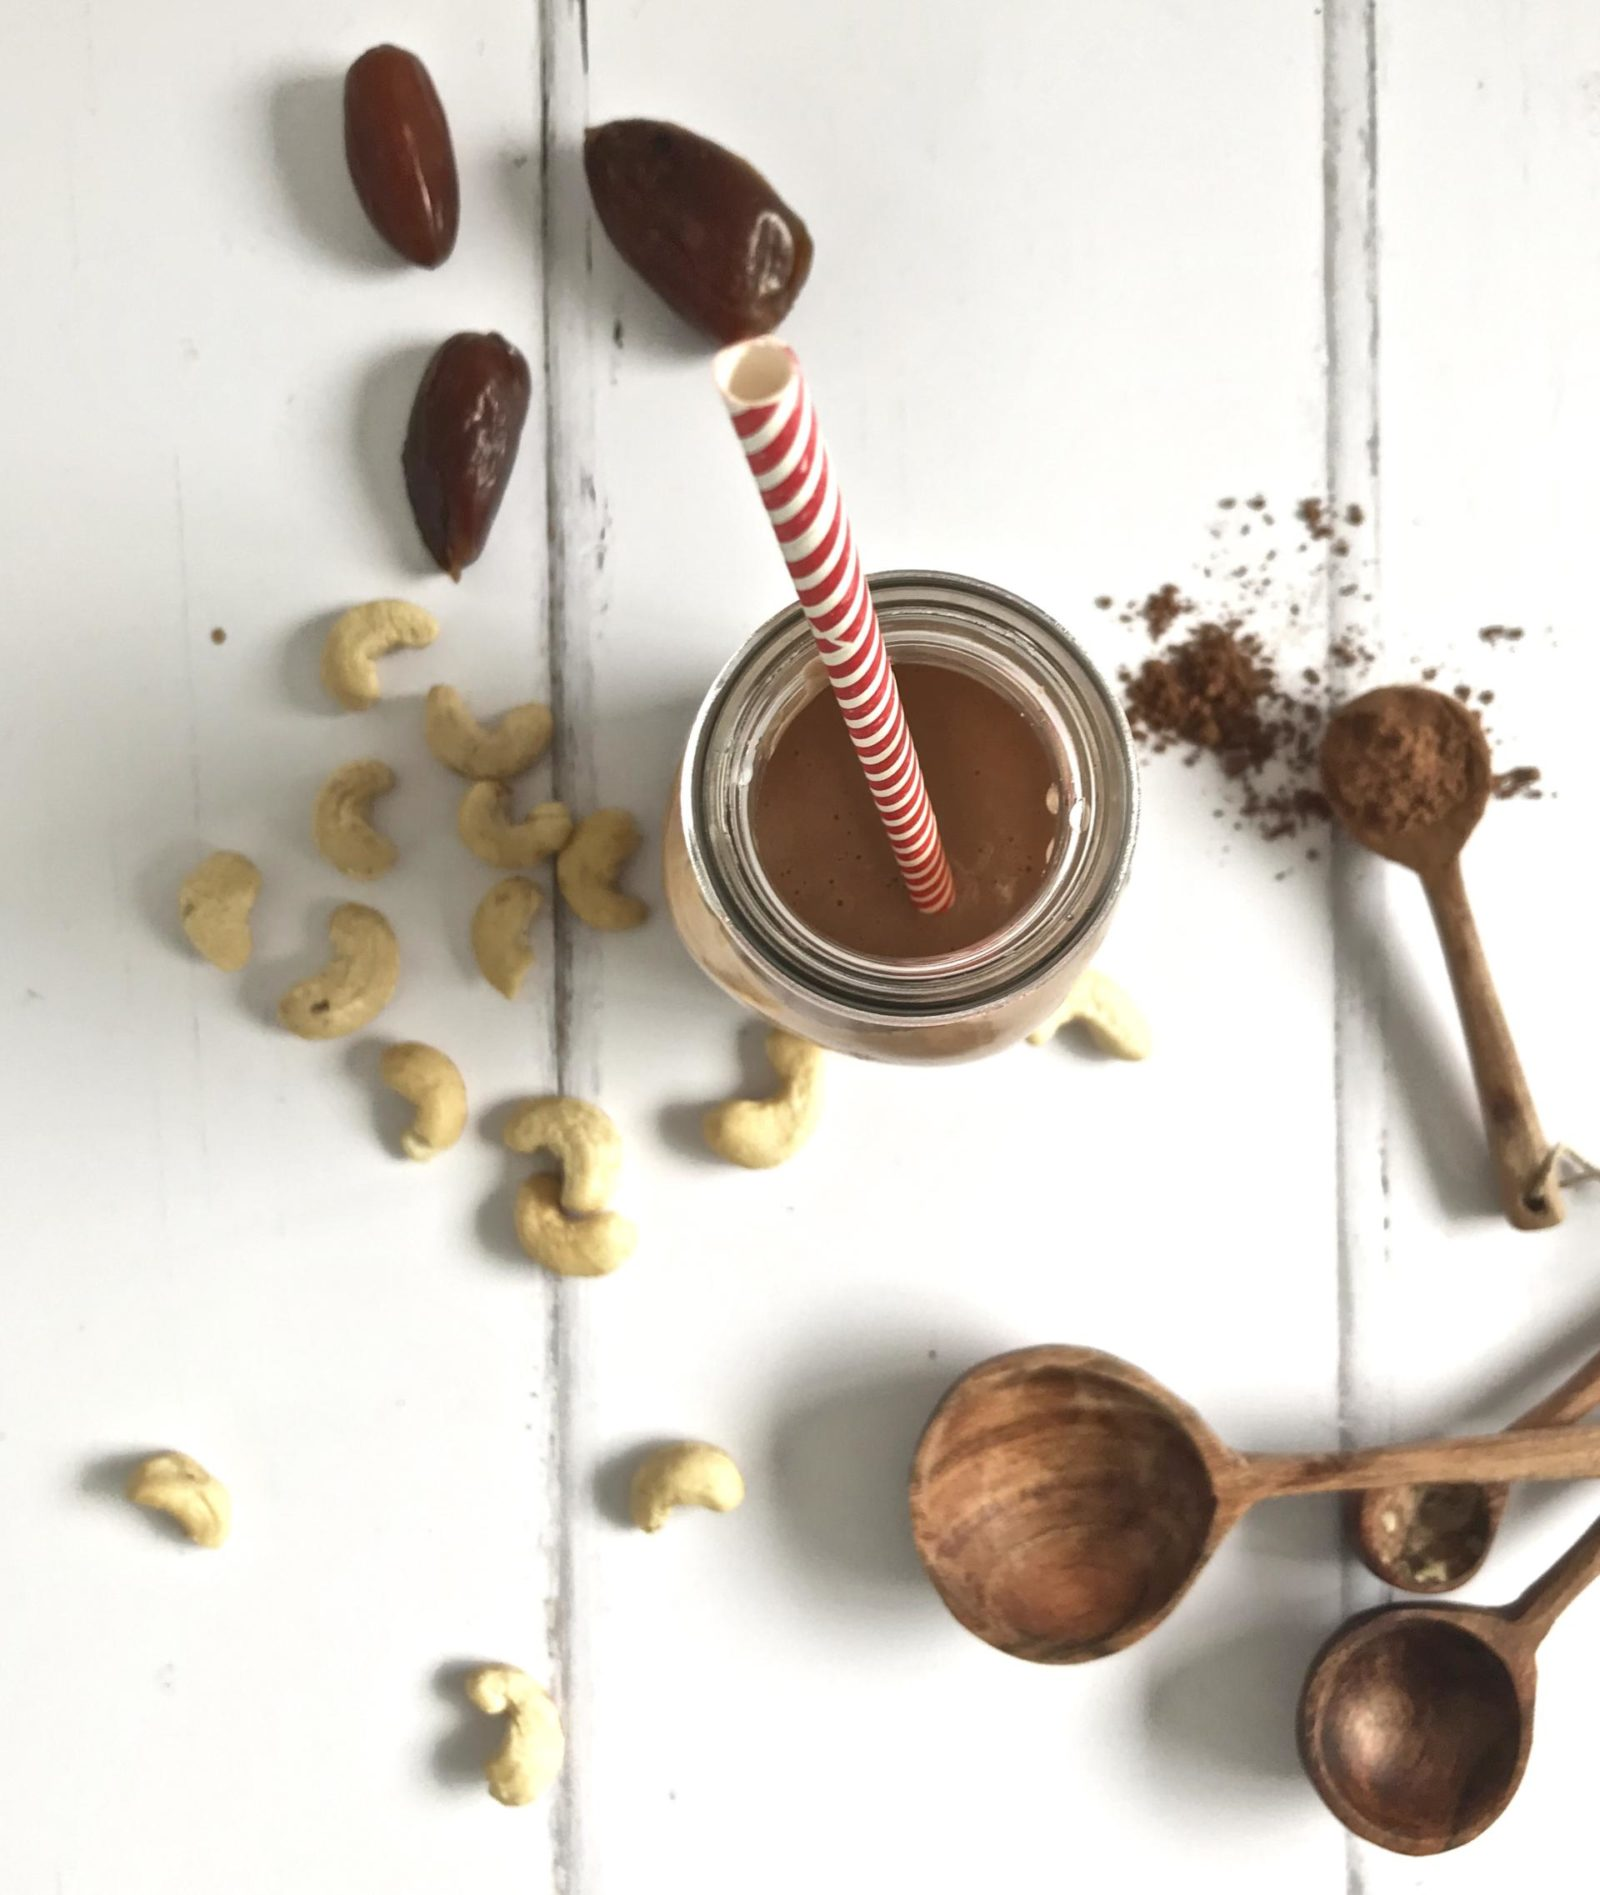 chocolate cashew milk nut milk